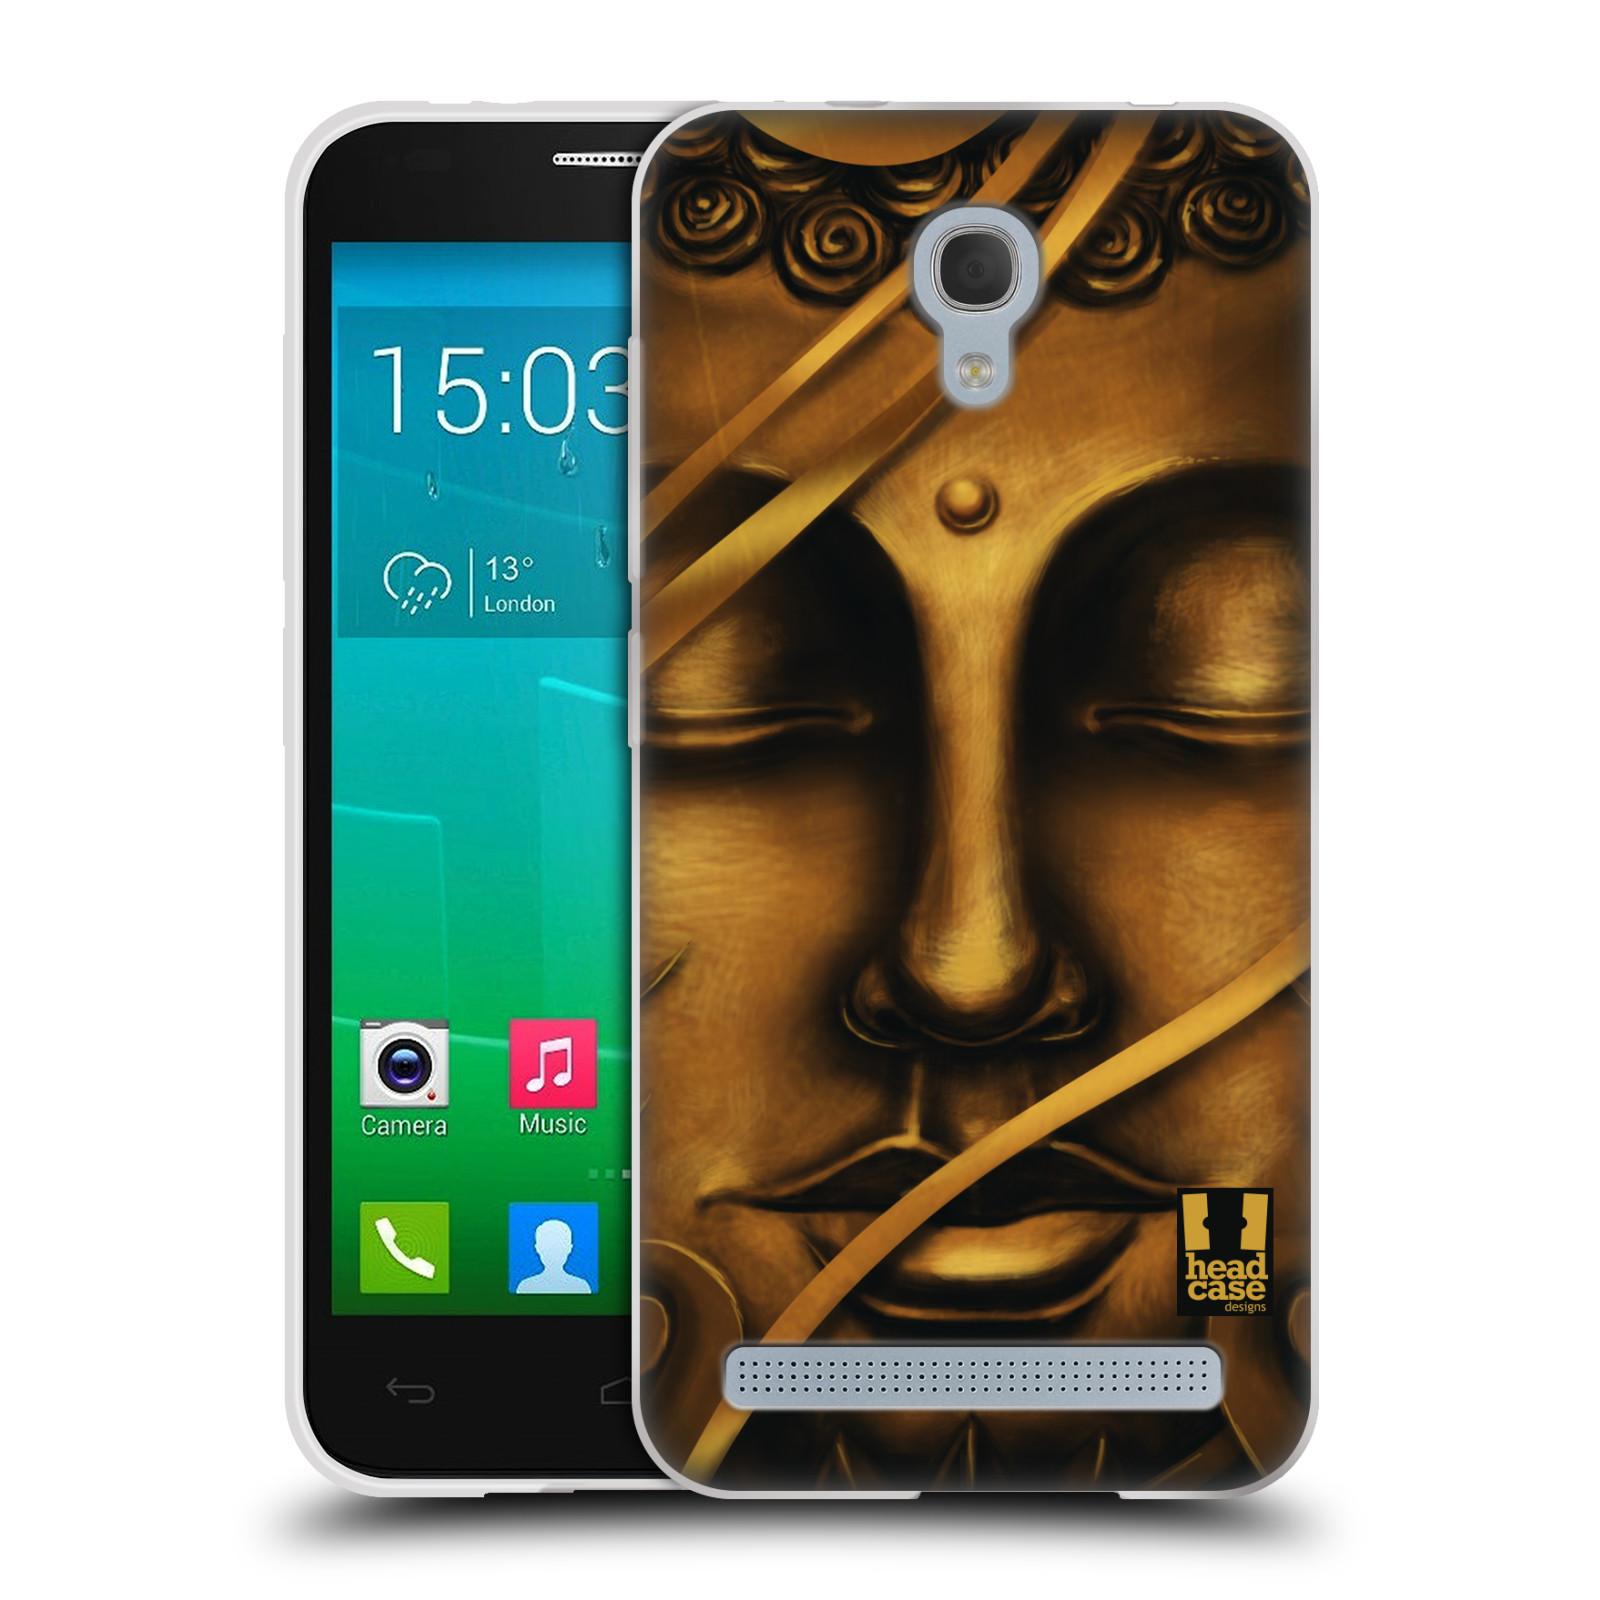 HEAD CASE silikonový obal na mobil Alcatel Idol 2 MINI S 6036Y vzor BUDDHA ZLATÝ BUDHA